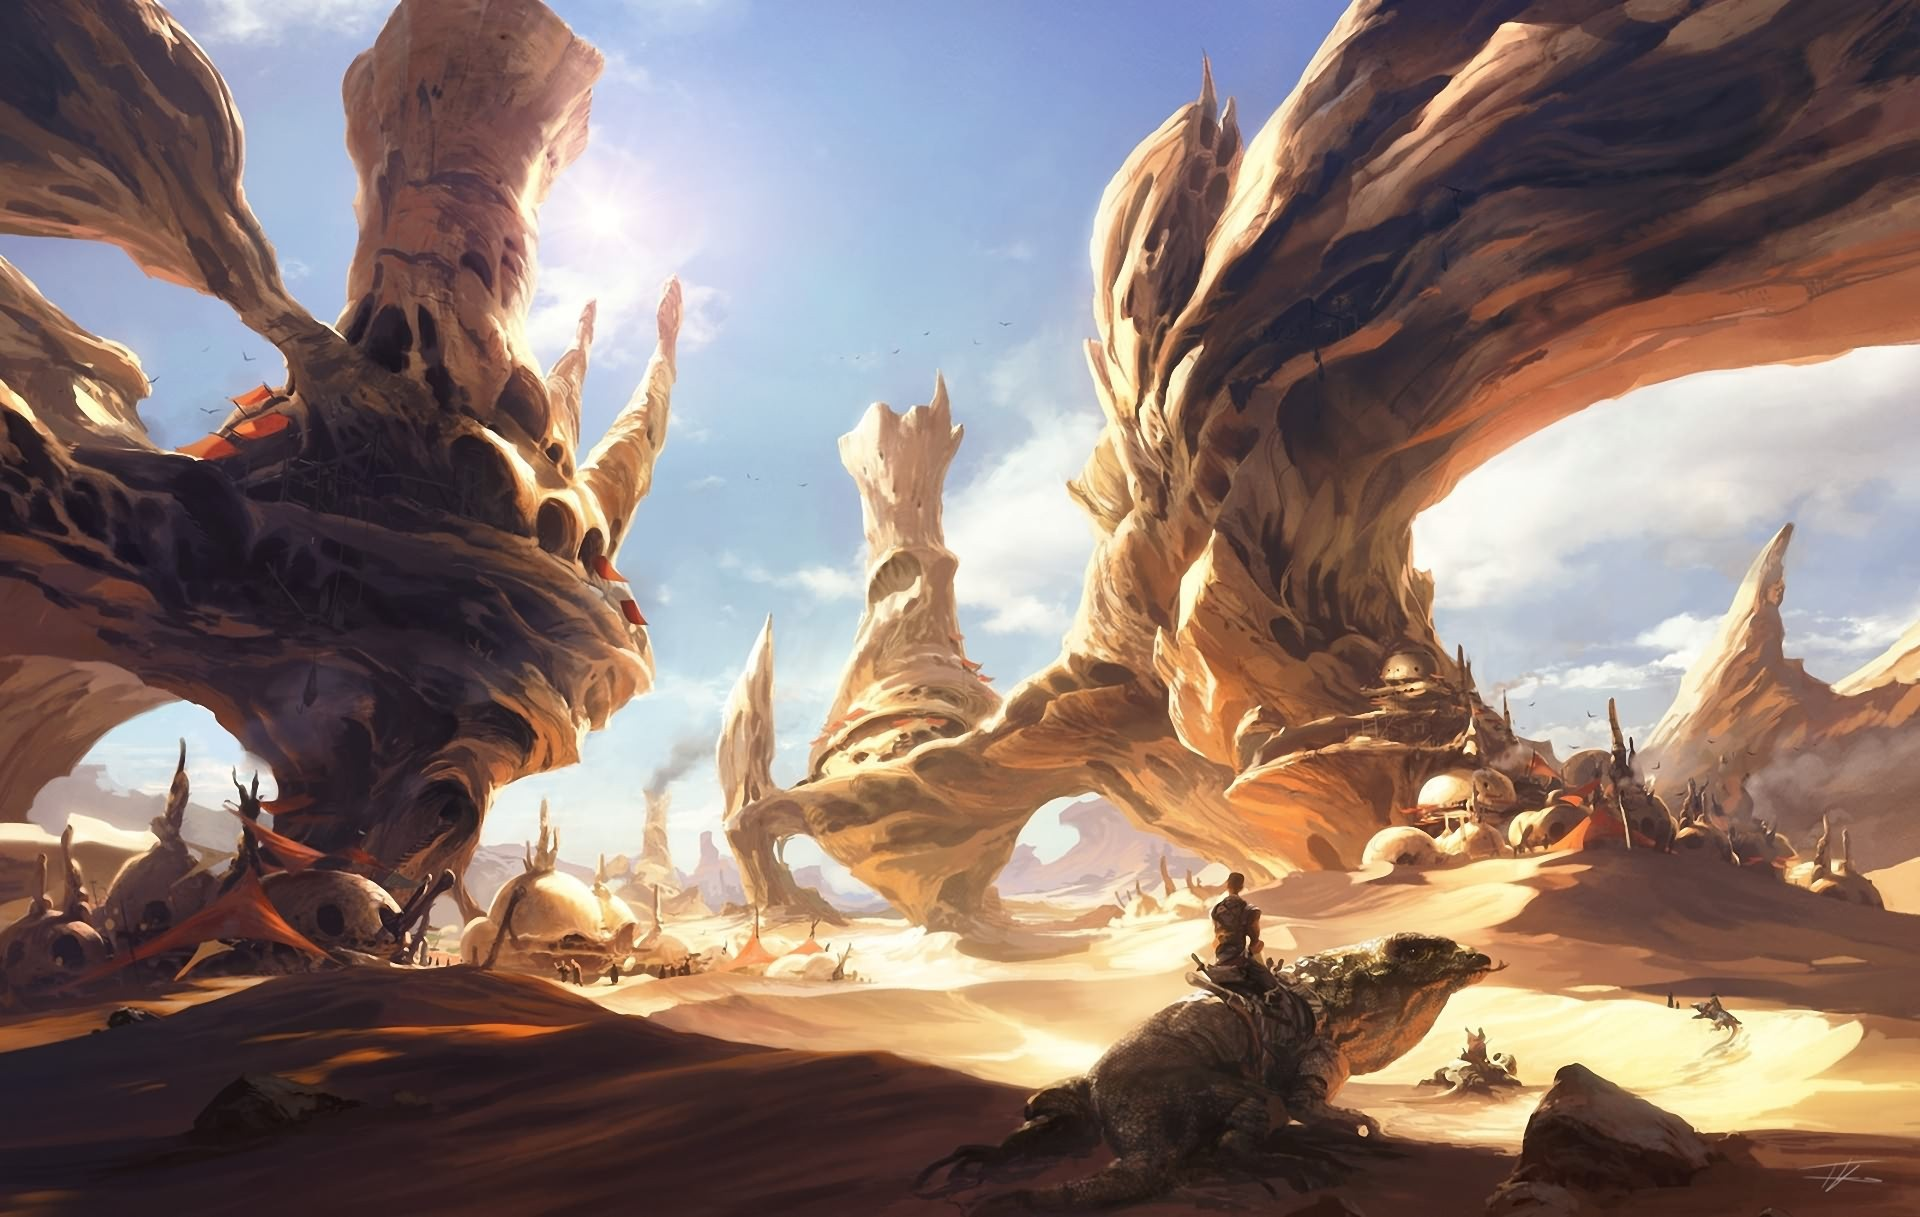 Картинки фантастические миры фантастика